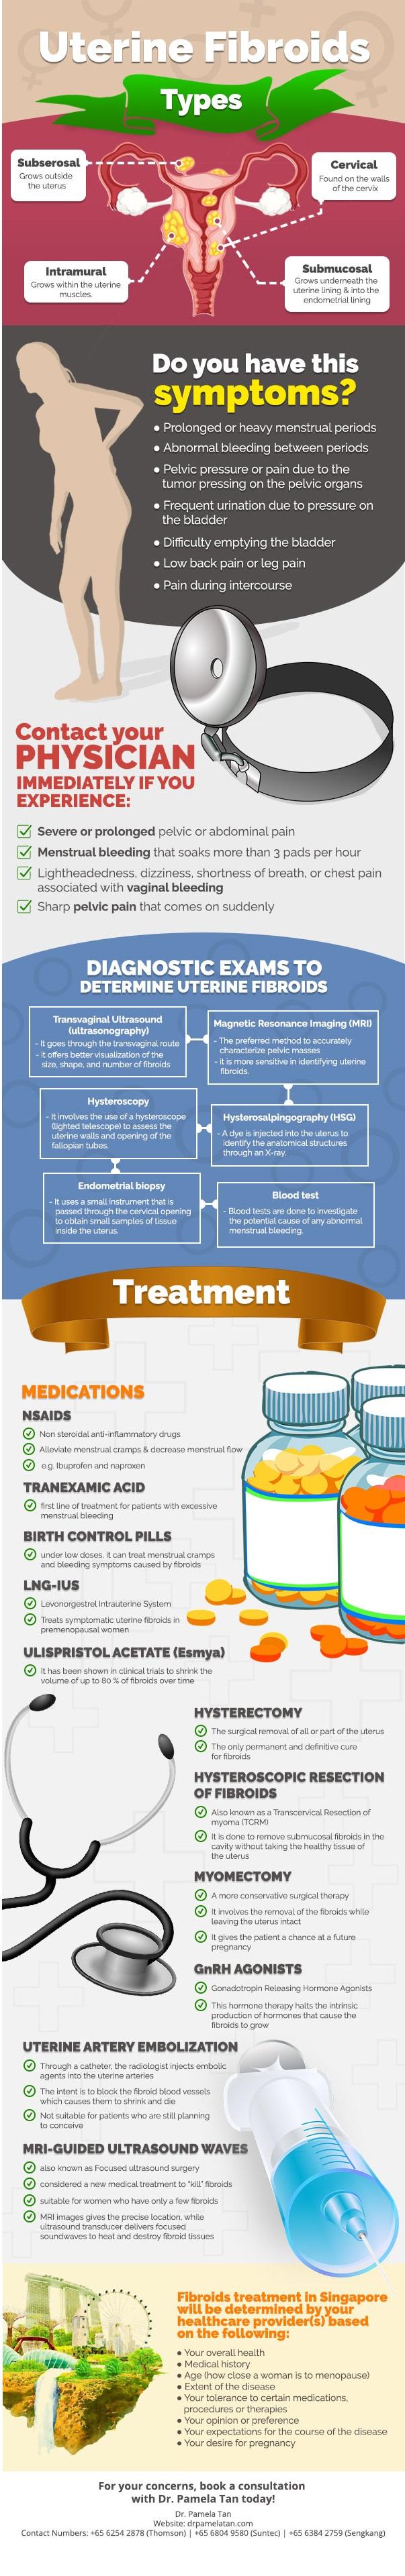 Uterine Fibroids Infographic by Dr Pamela Tan